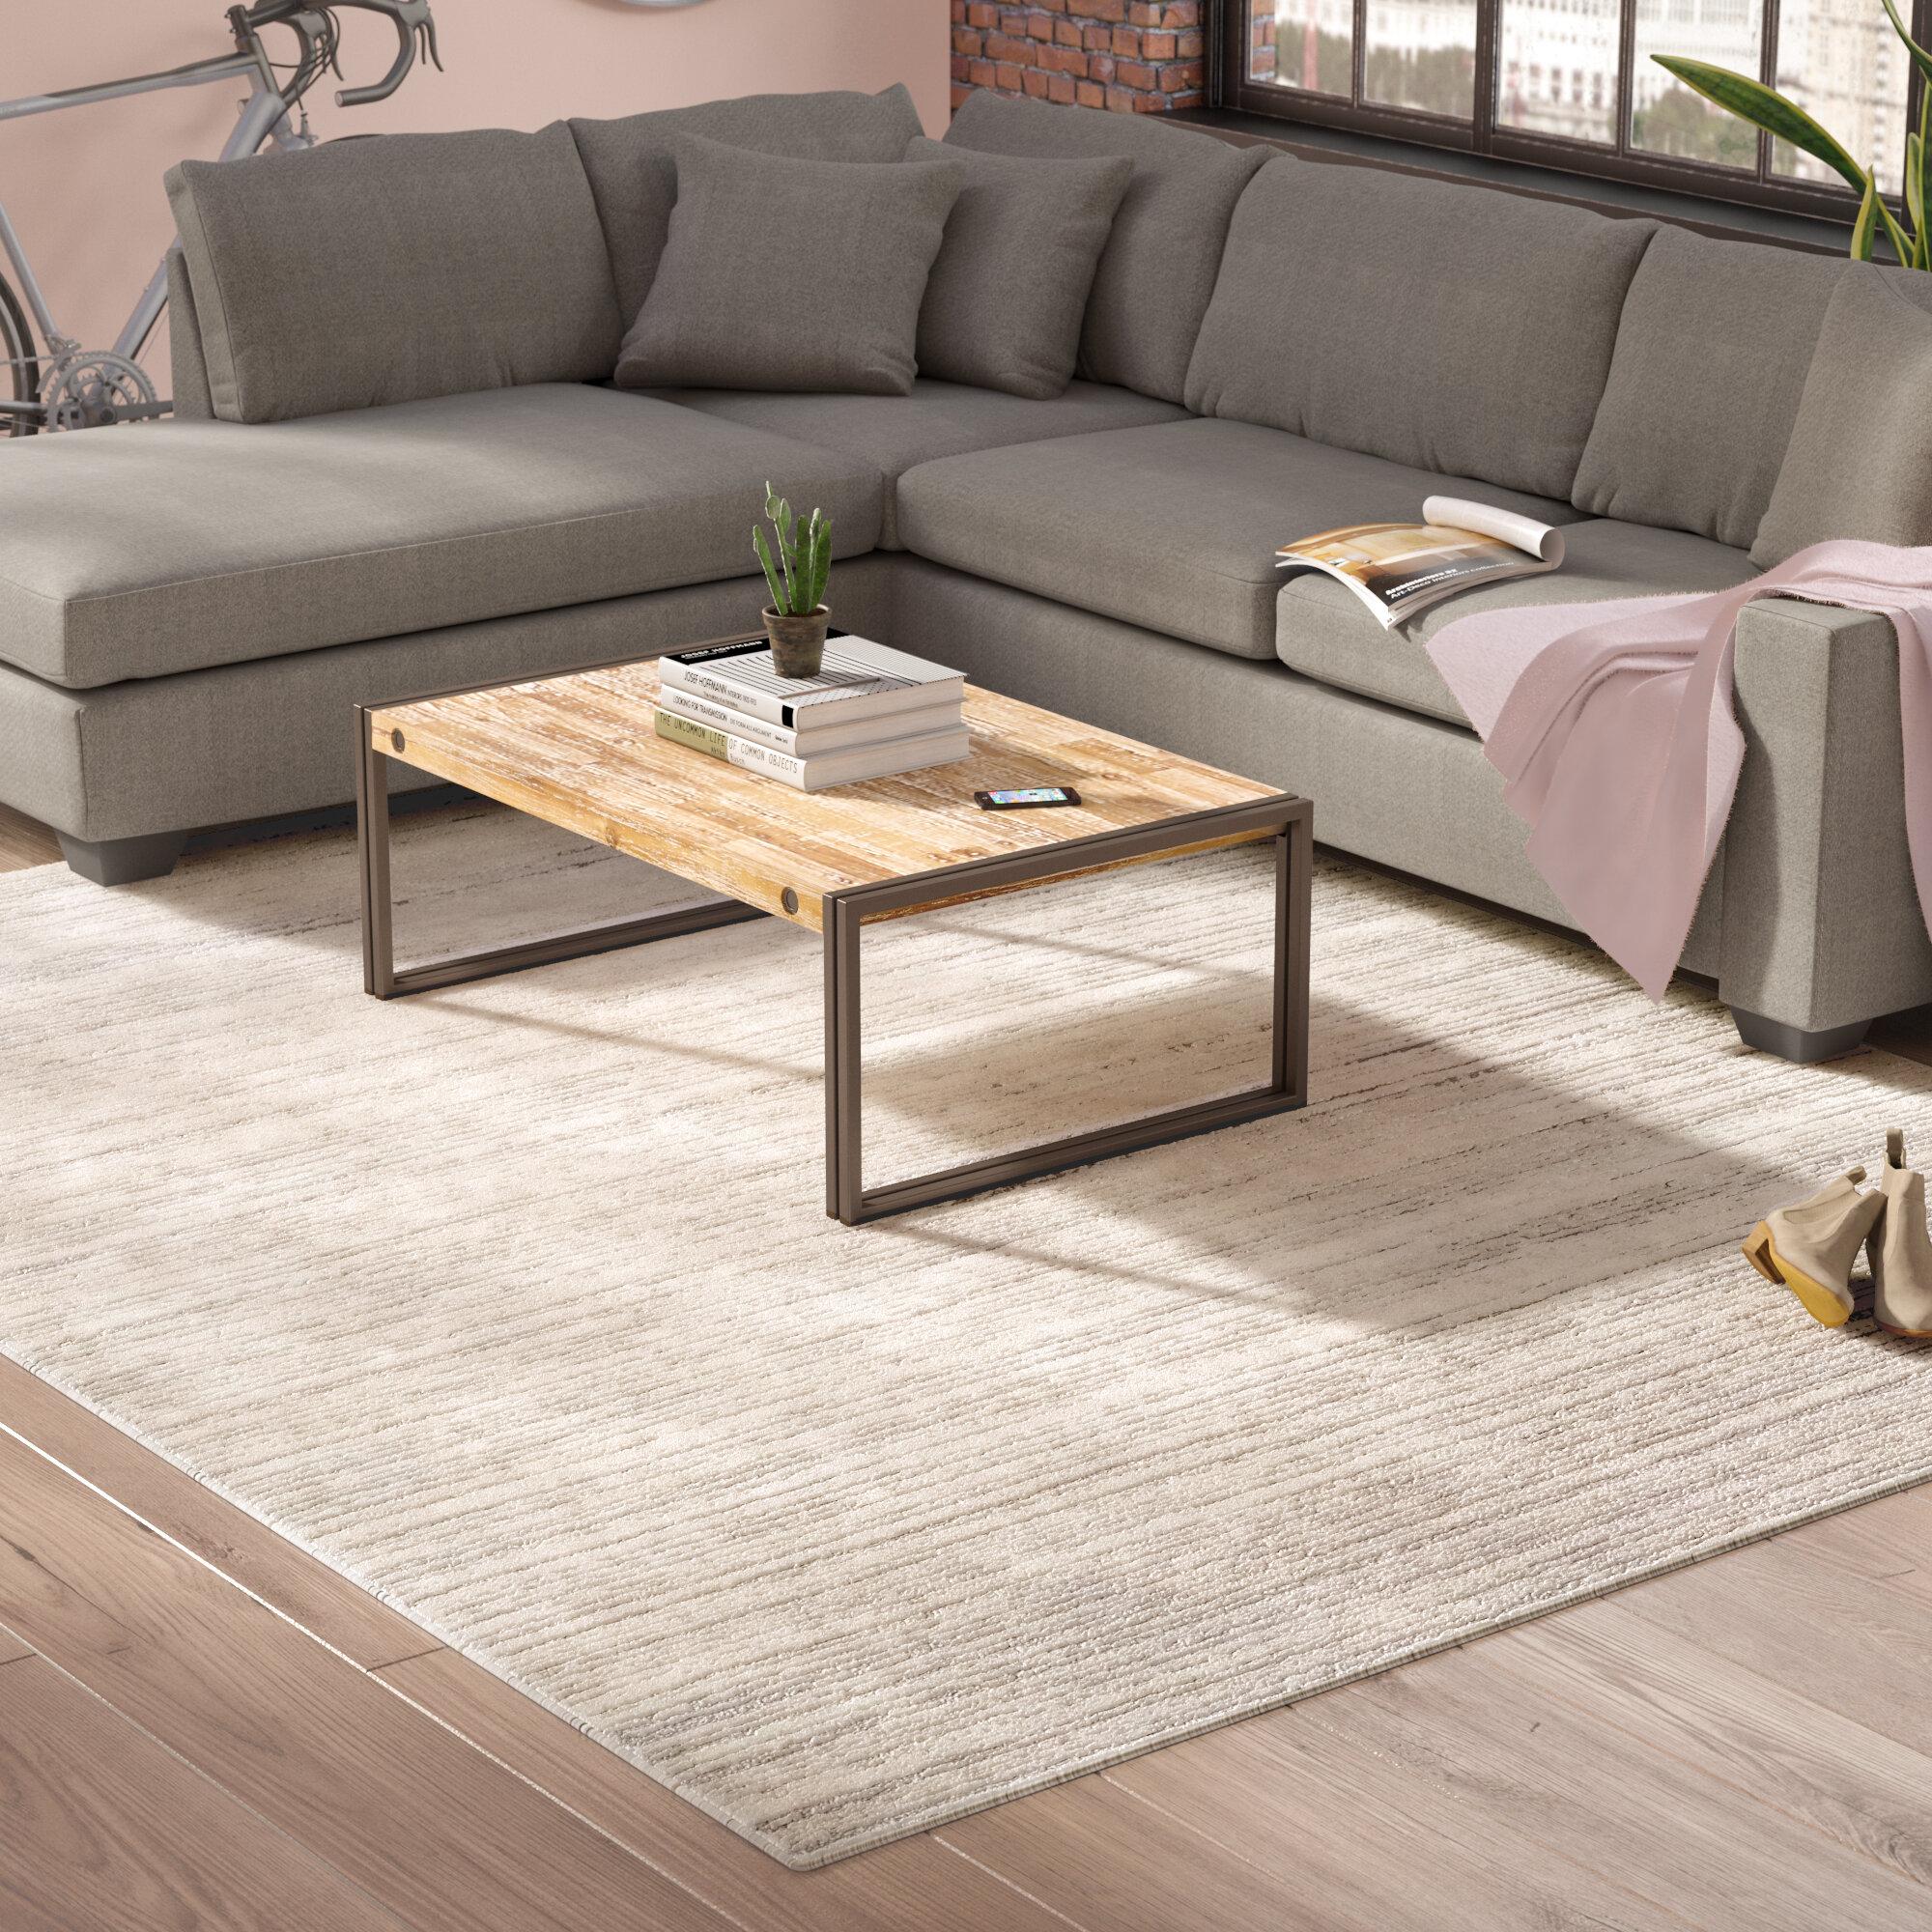 Living Room Shag Rug   Greyleigh Bridgeton Distressed Modern Brown Gray Sleek Area Rug